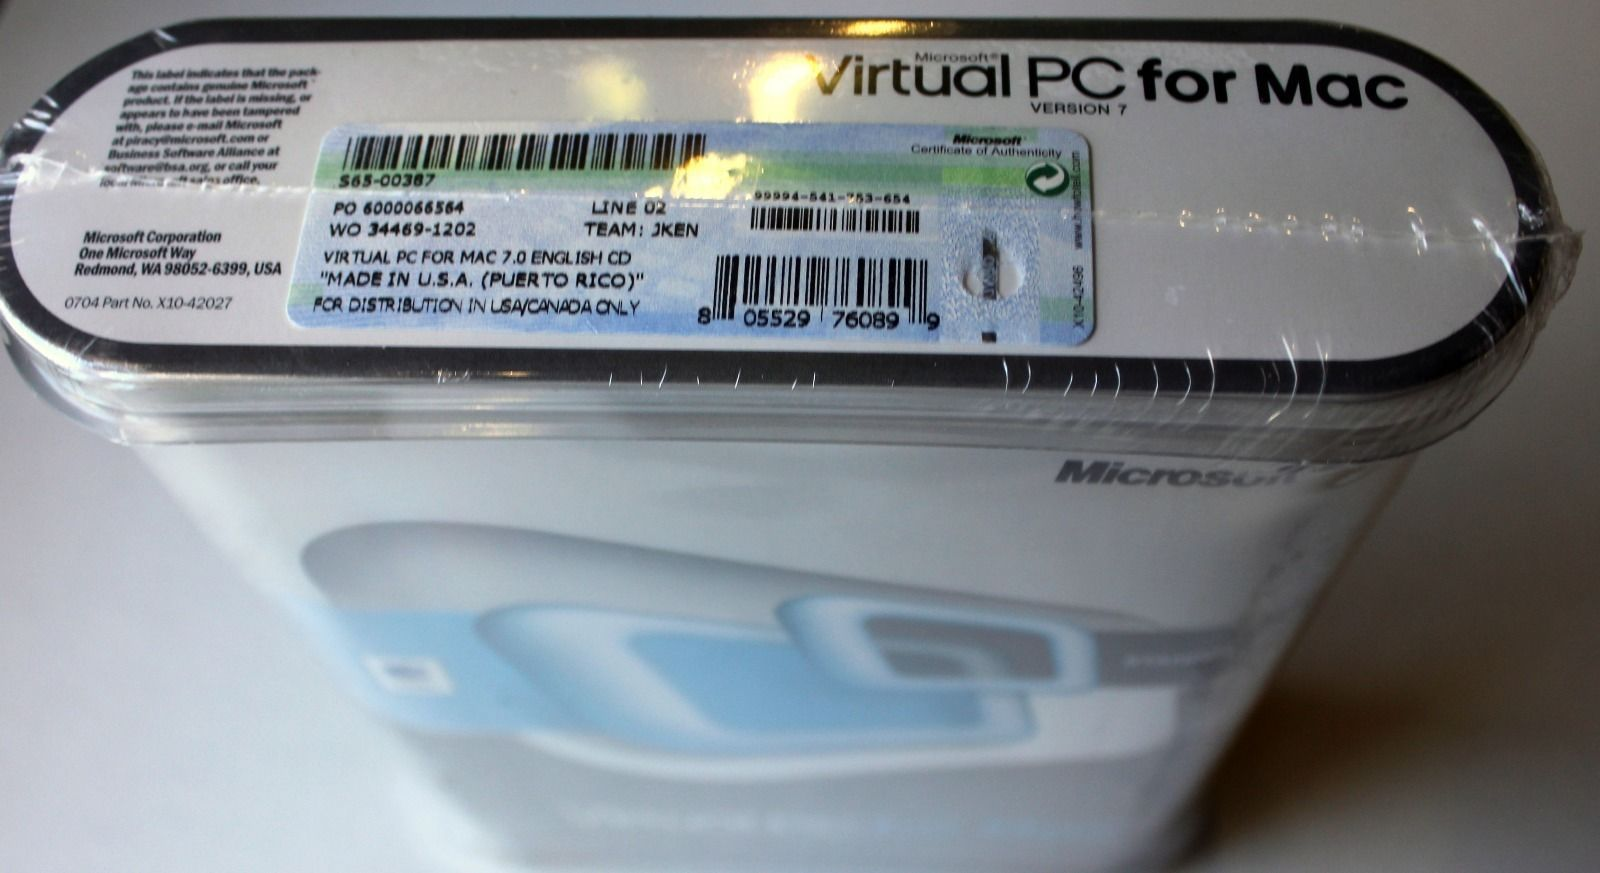 virtual pc for mac 7.0